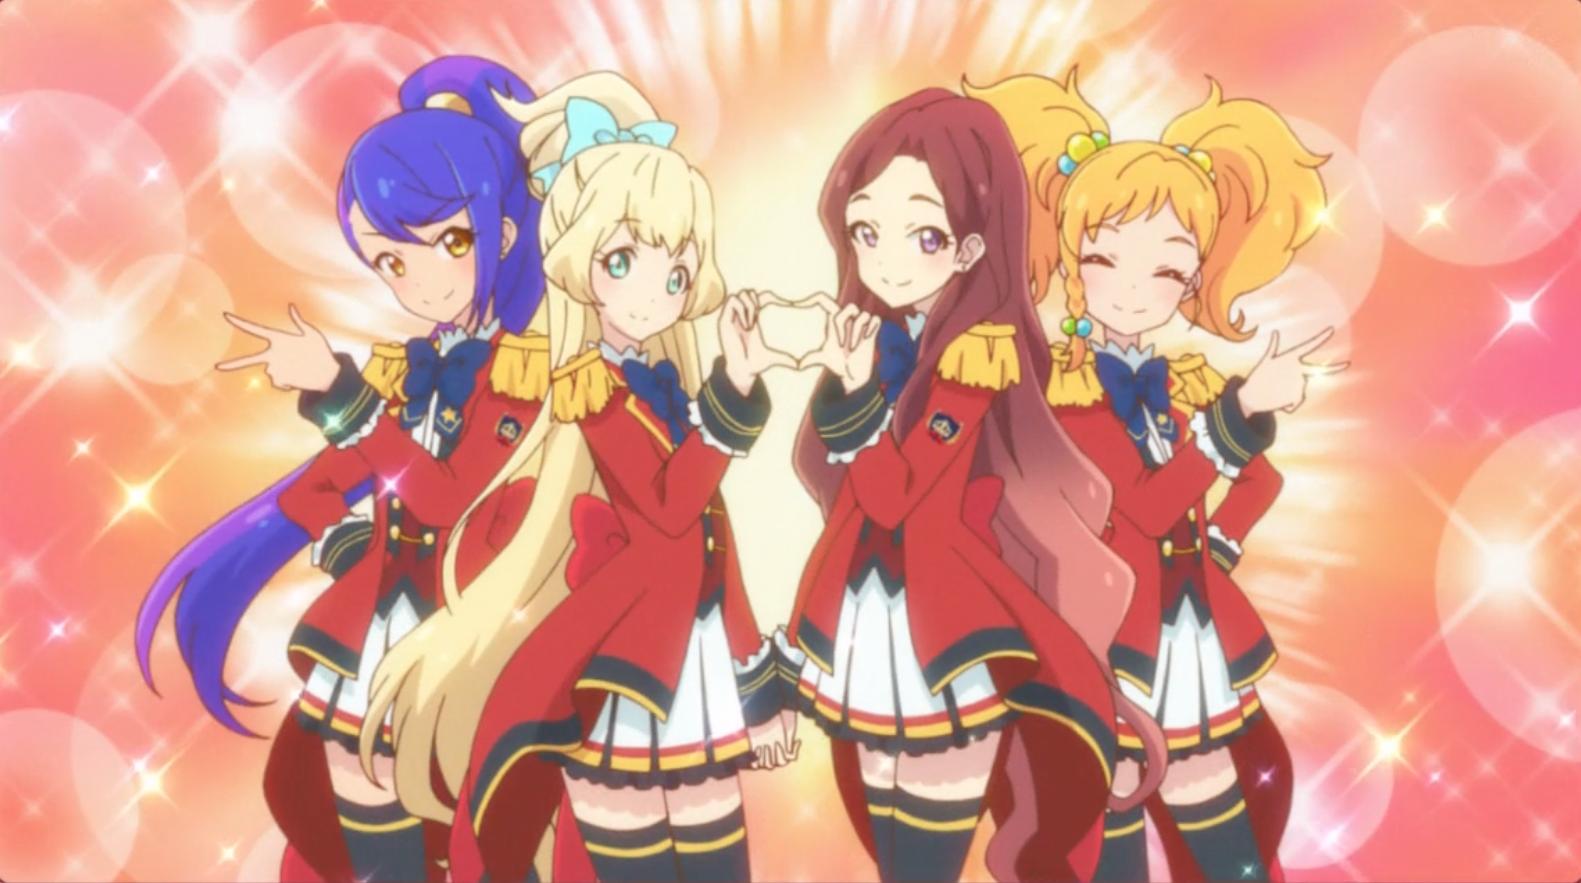 Aikatsu Stars se reúne con Aikatsu en el episodio 2 de Cross-Over